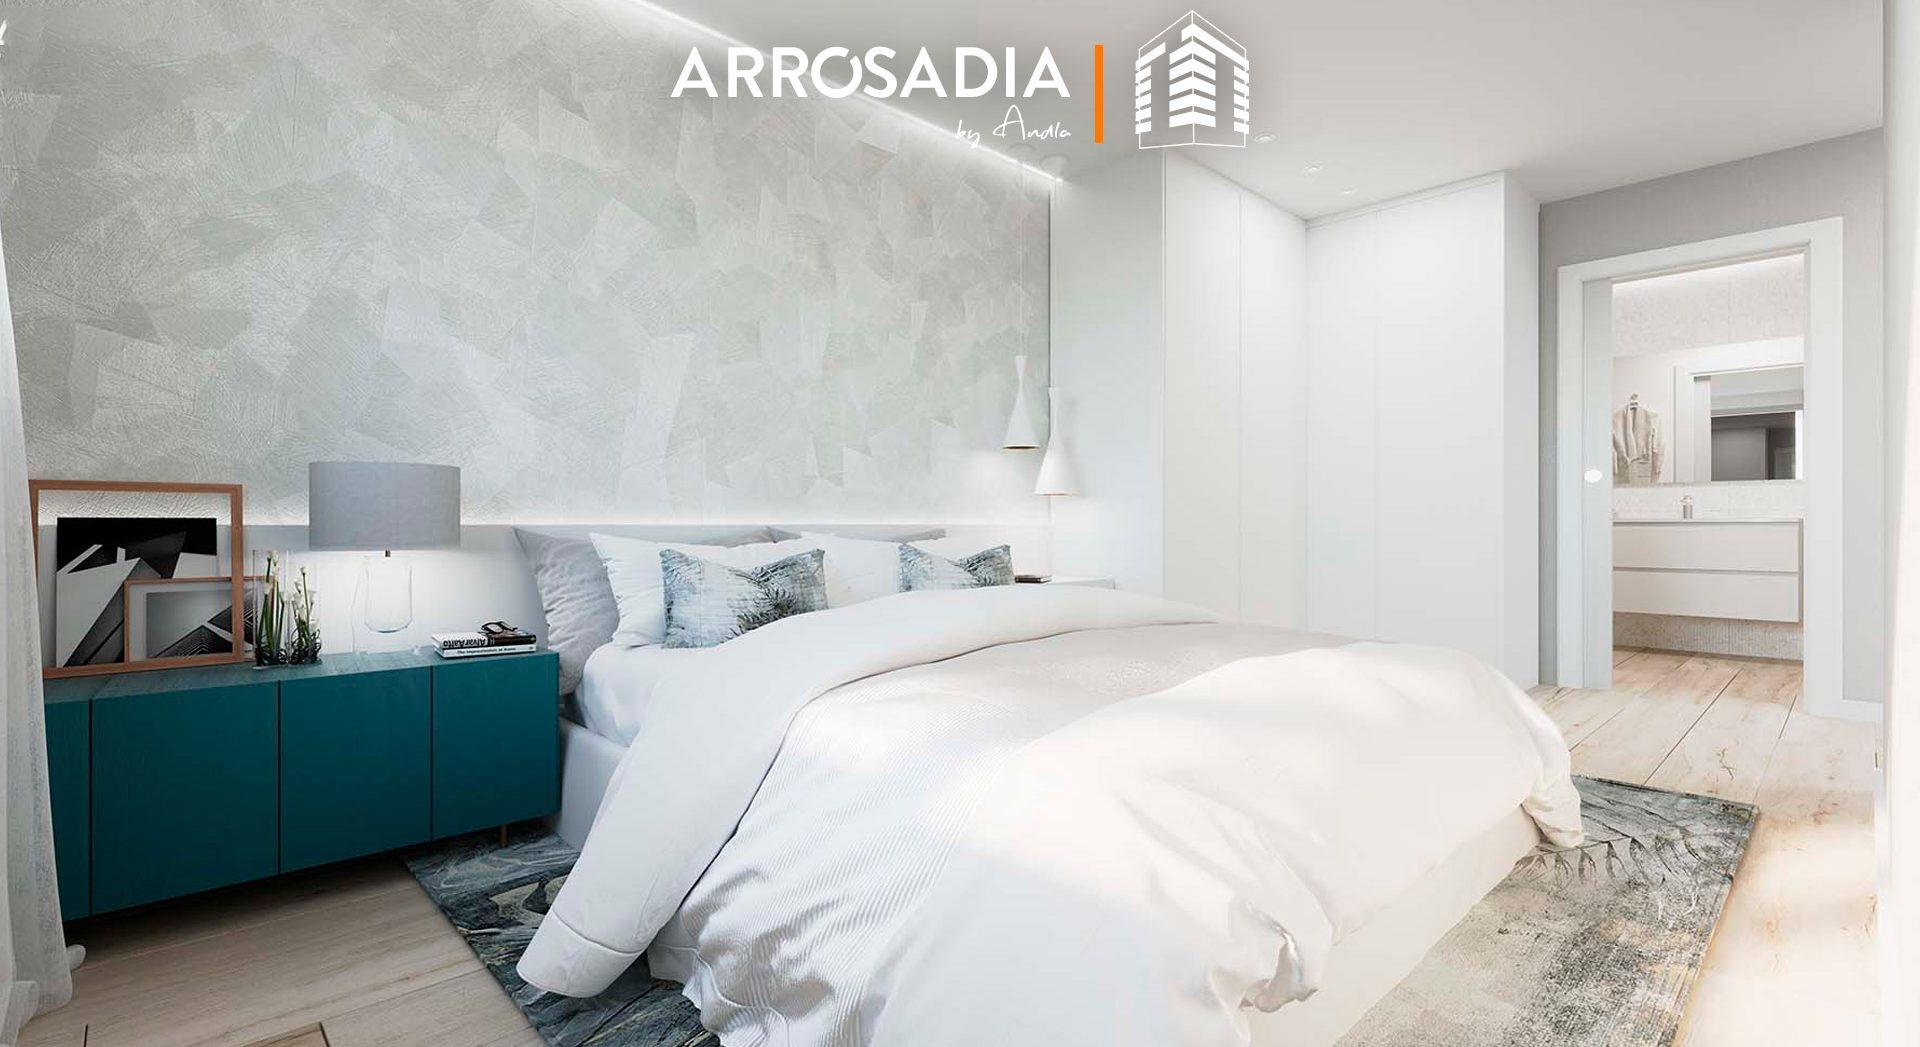 ANDIA_ARROSADIA_HABITACION-slide-1920x1047